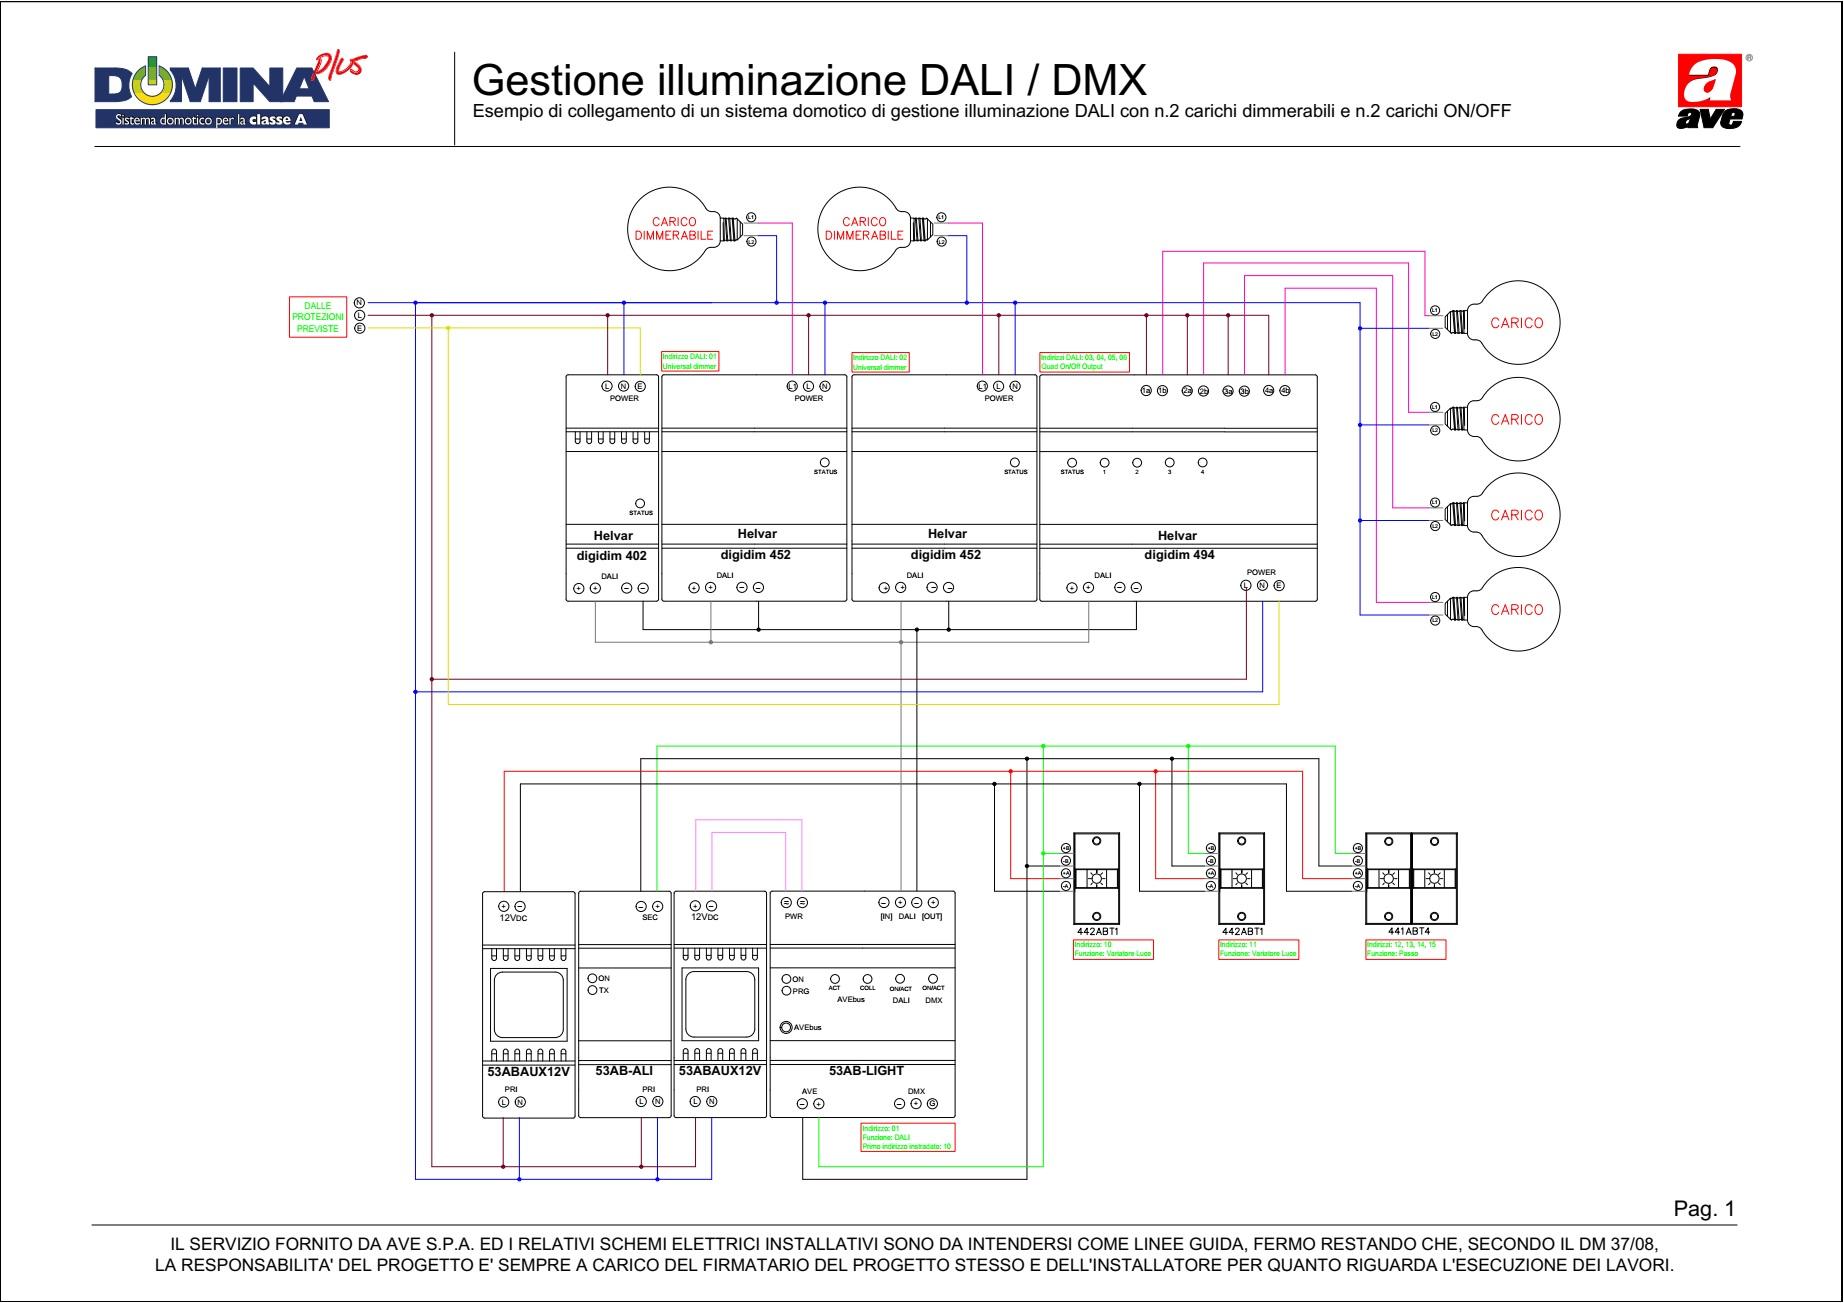 Gestione illuminazione DALI - DMX